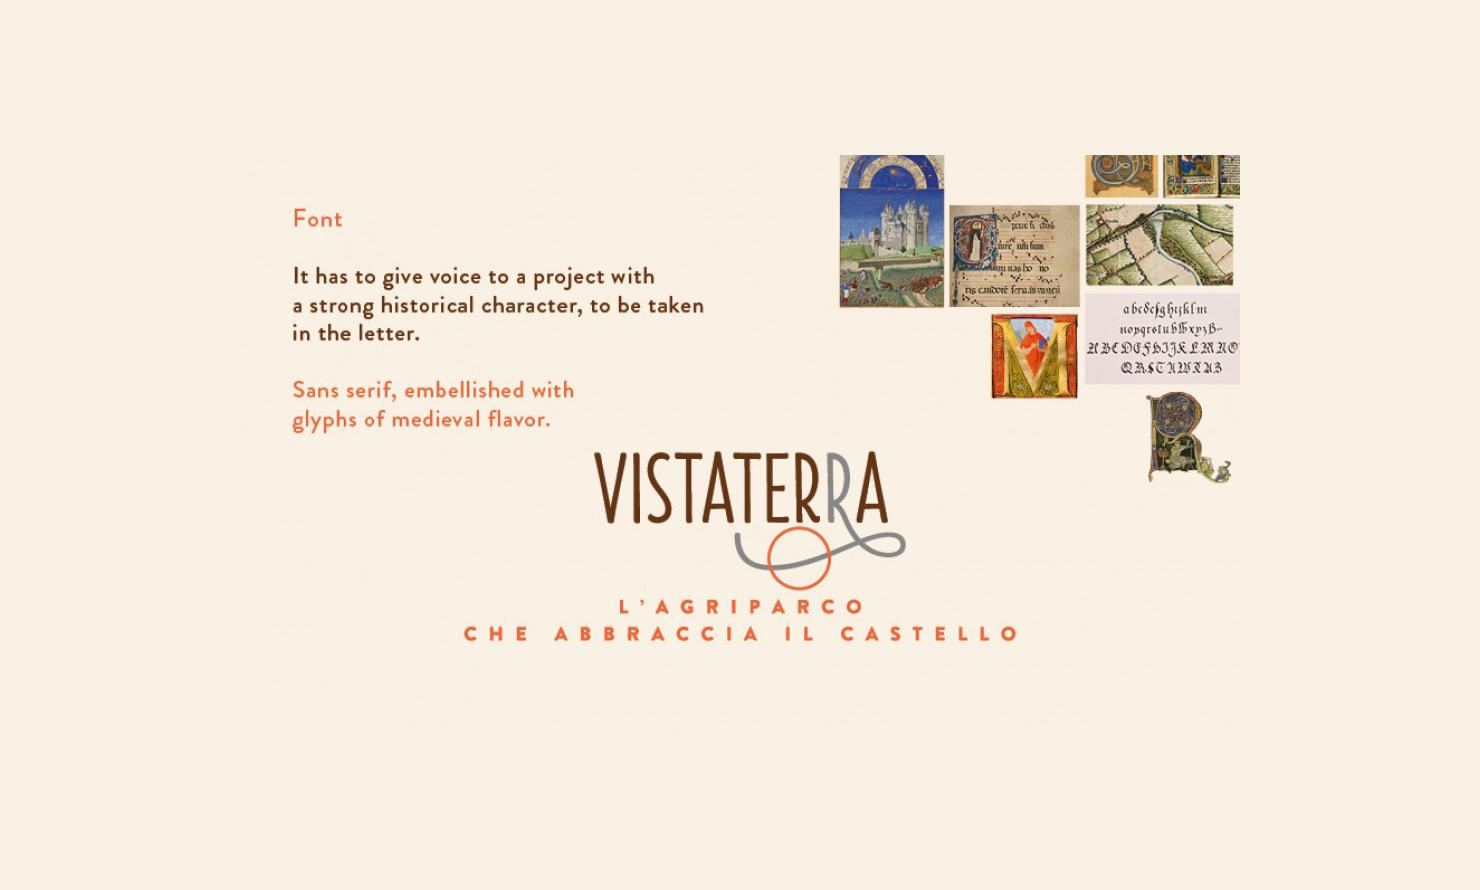 https://kubelibre.com/uploads/Slider-work-tutti-clienti/manital-vistaterra-l-agriparco-che-abbraccia-il-castello-brand-identity-brand-strategy-6.jpg